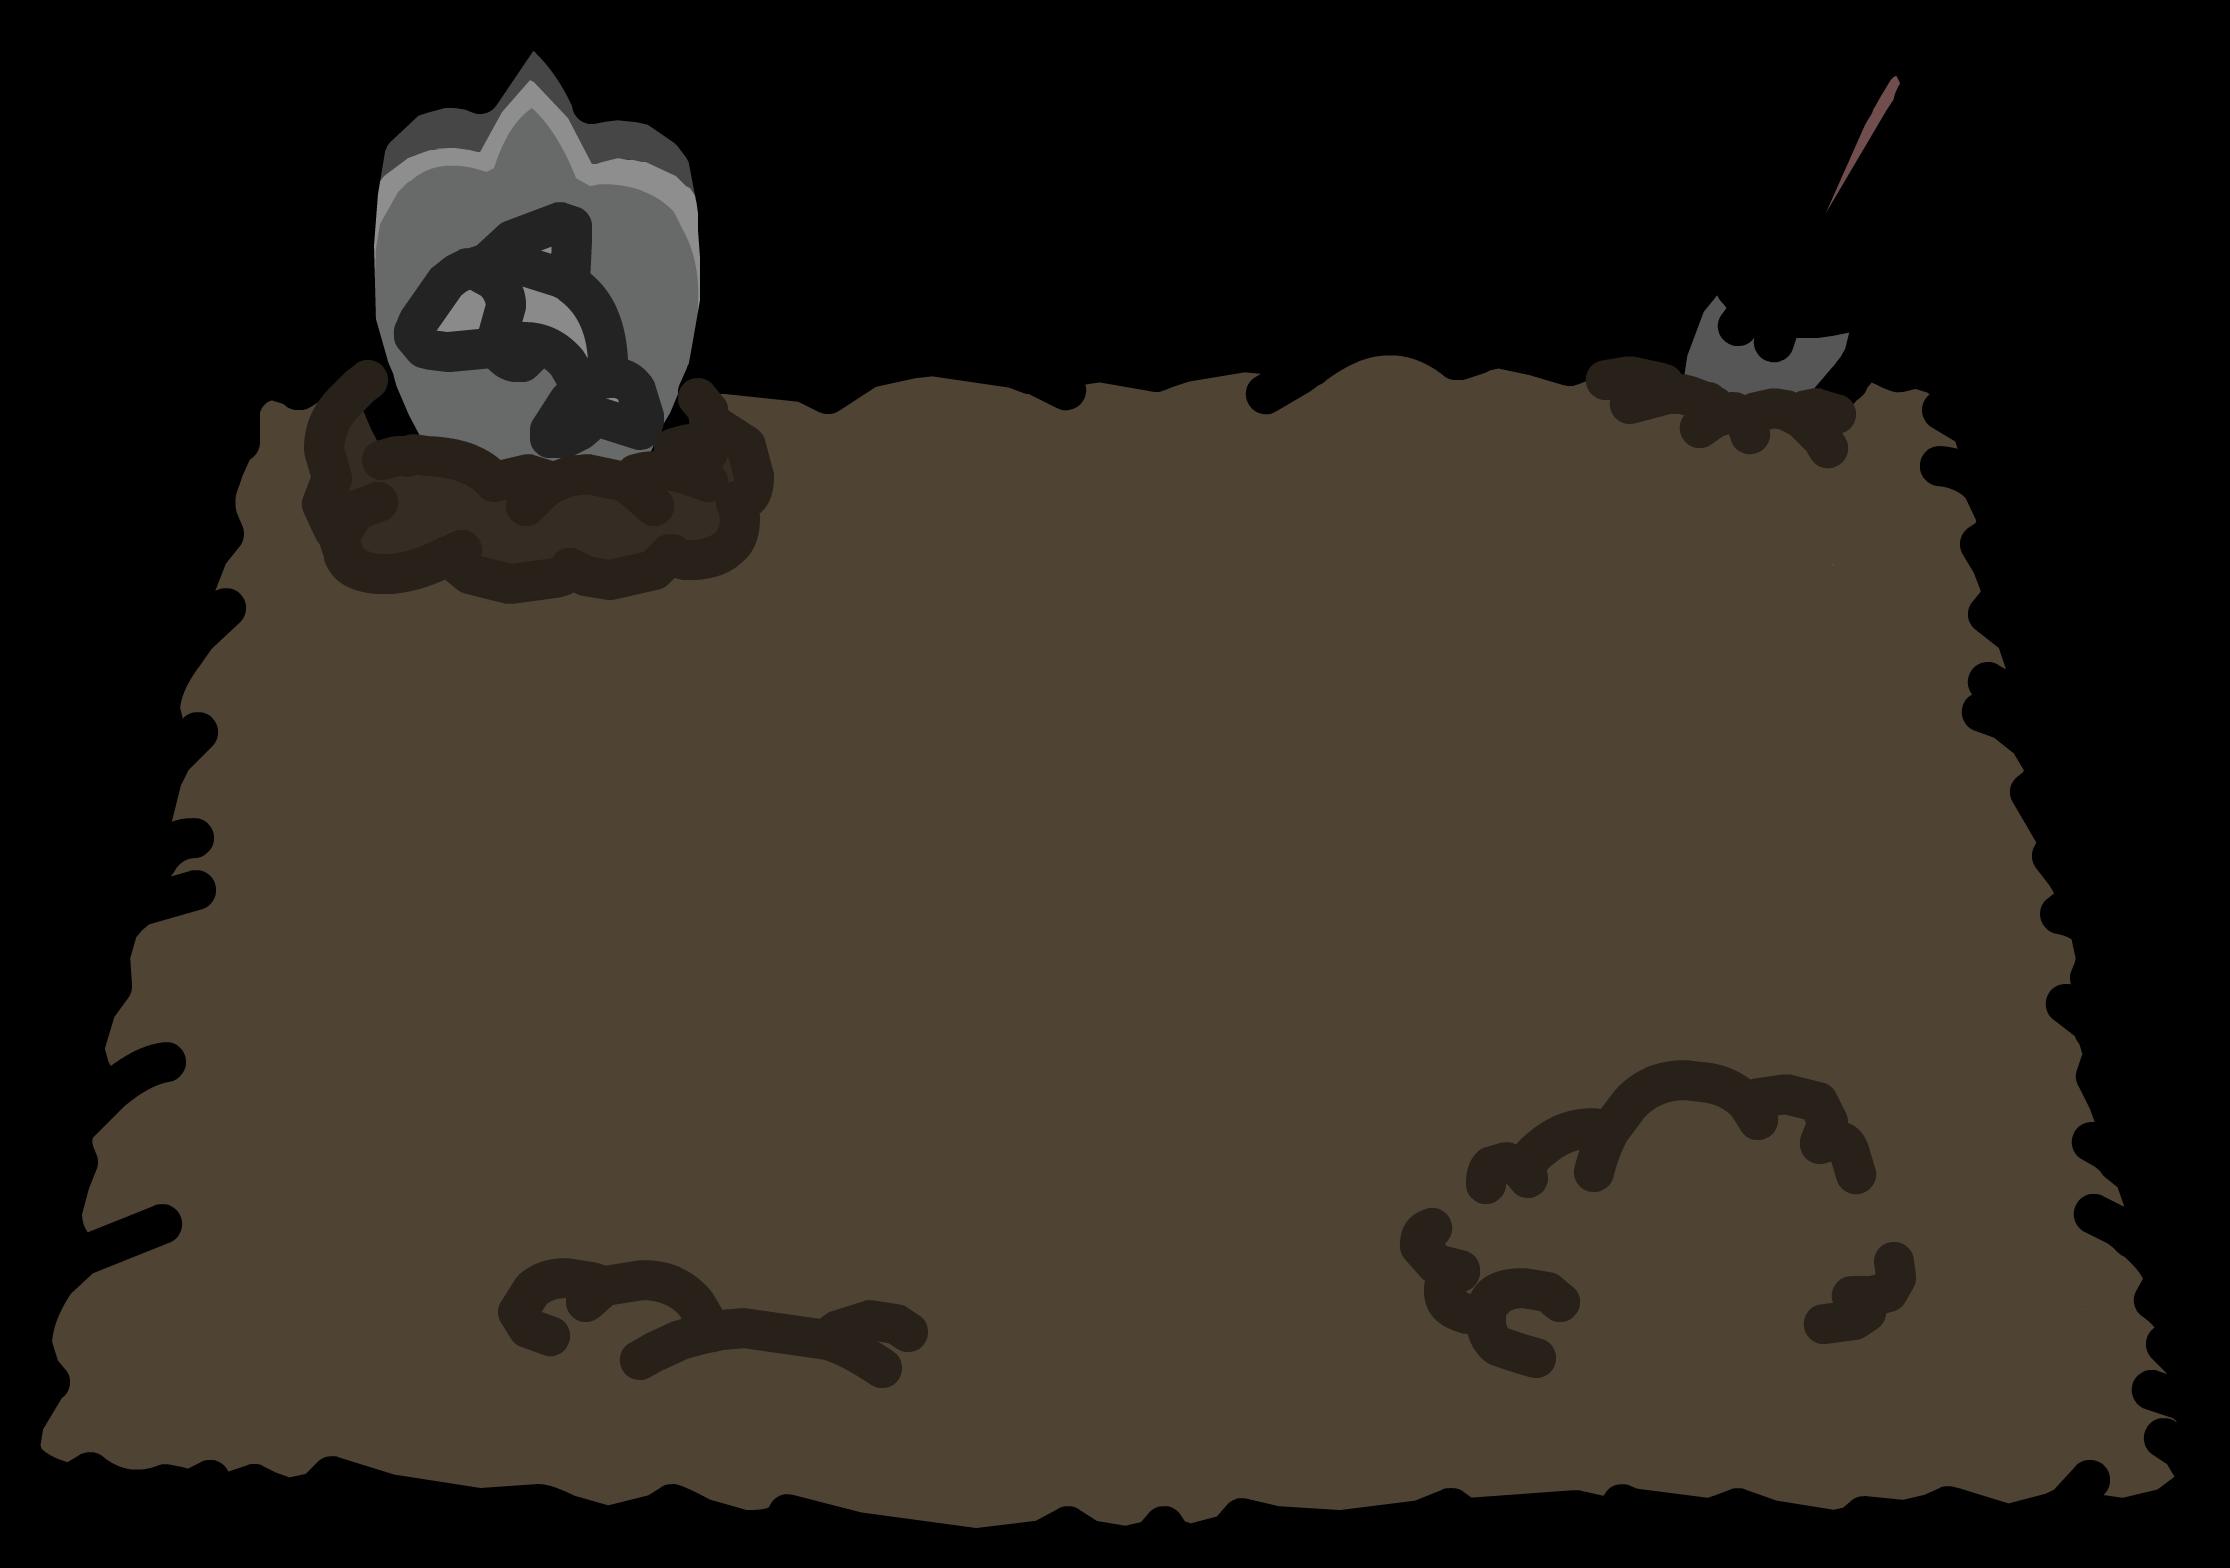 Graveyard plot club penguin. Dirt clipart brown rock